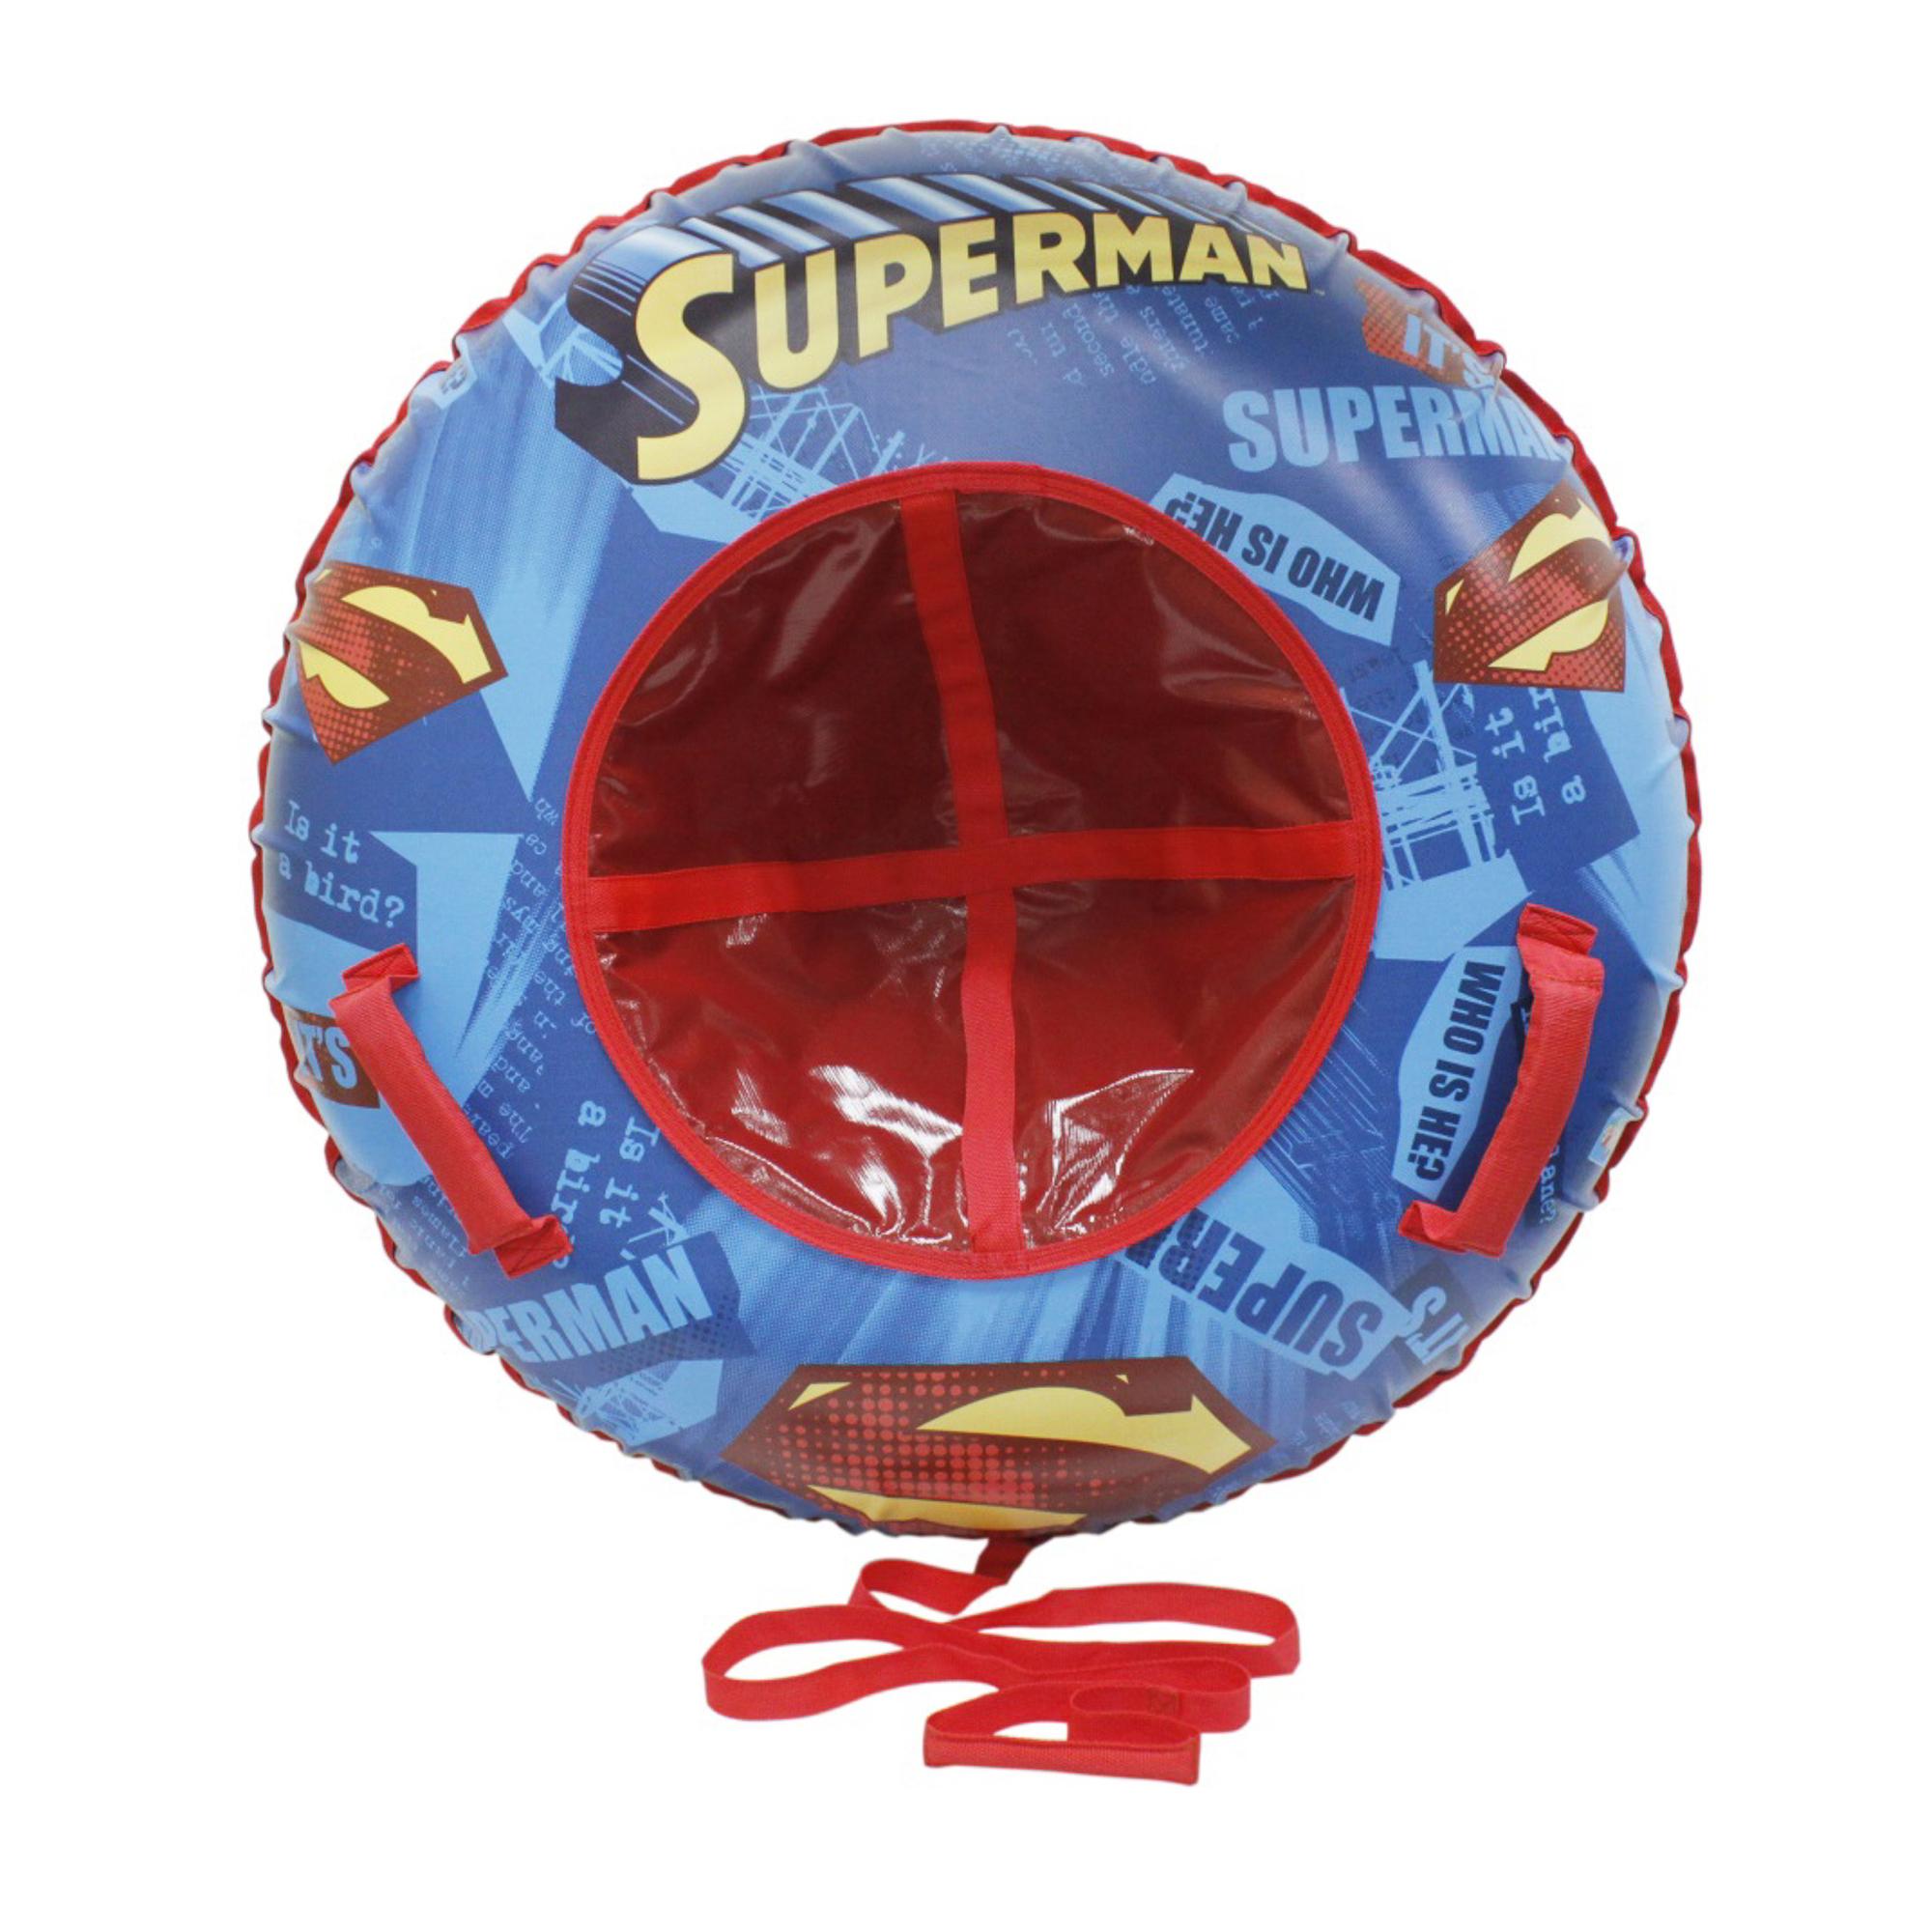 нейроскакалка 1toy 86 см Тюбинг 1Toy Супермен 85 см